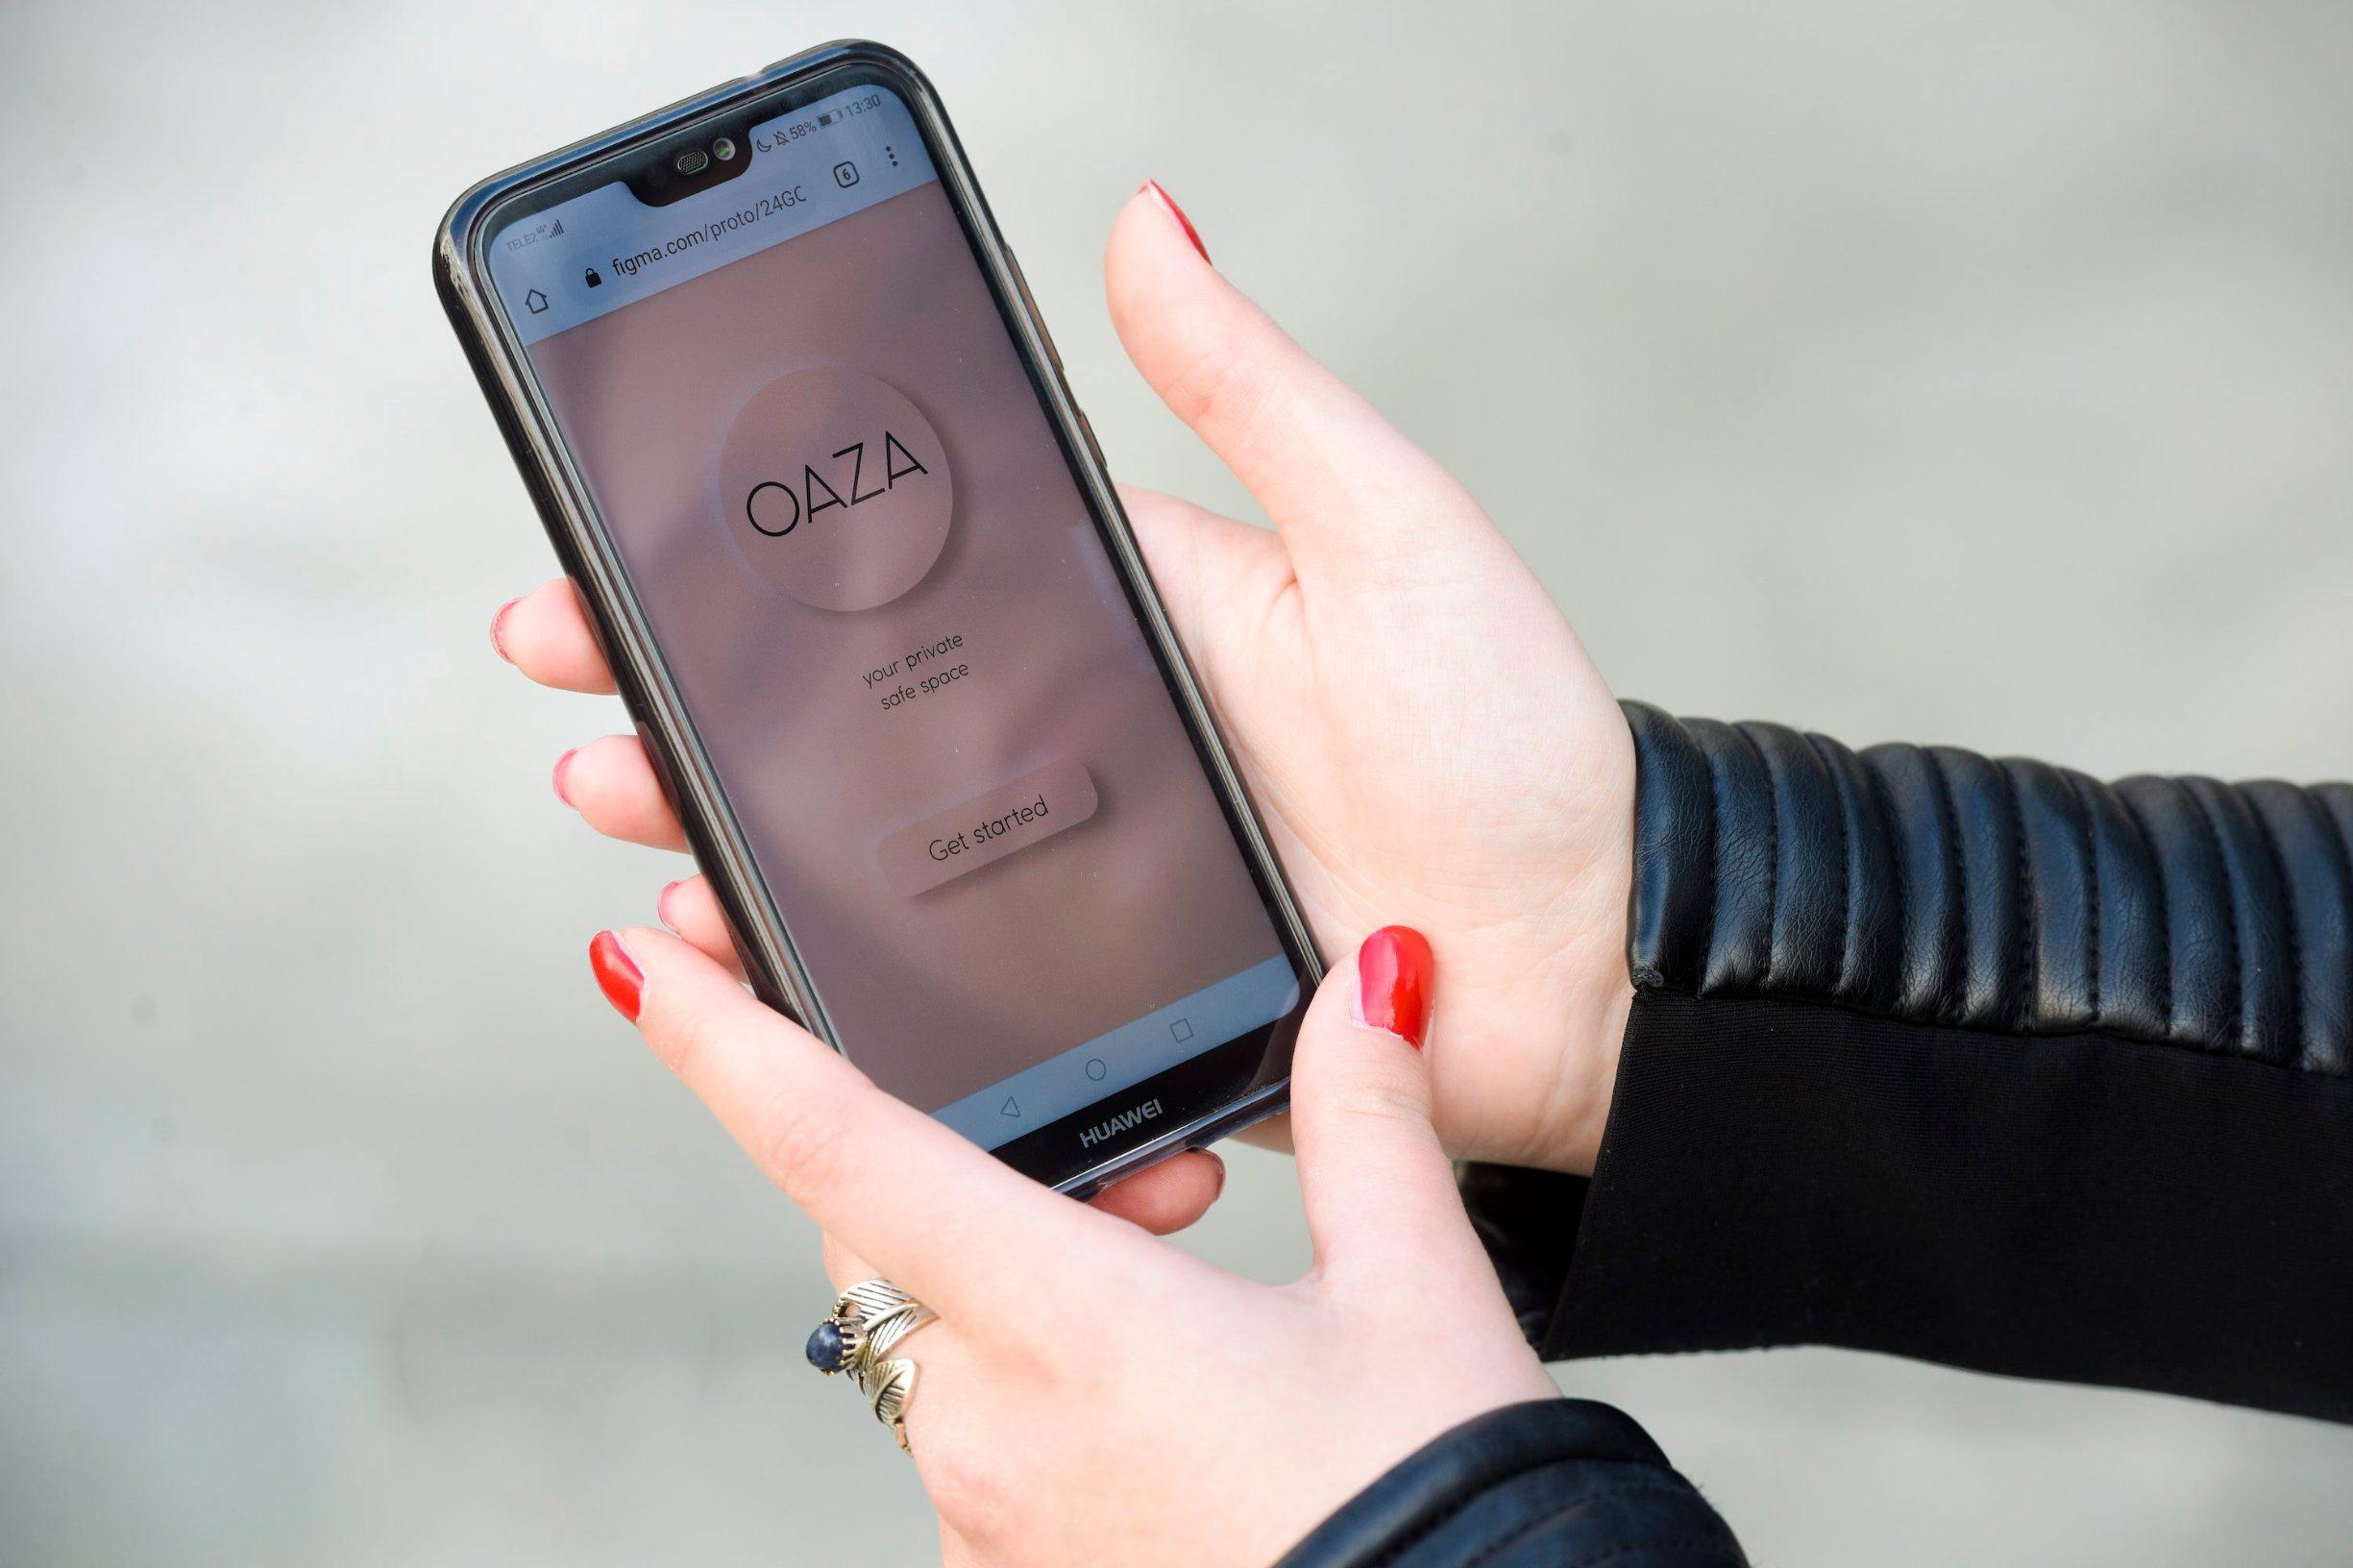 Zagreb, 030320. Gradiscanska 30. Karla Curin, studentica grafickog dizajna koja je osmislila aplikaciju OAZA za pomoc osobama s psihickim problemima. Foto: Darko Tomas / CROPIX